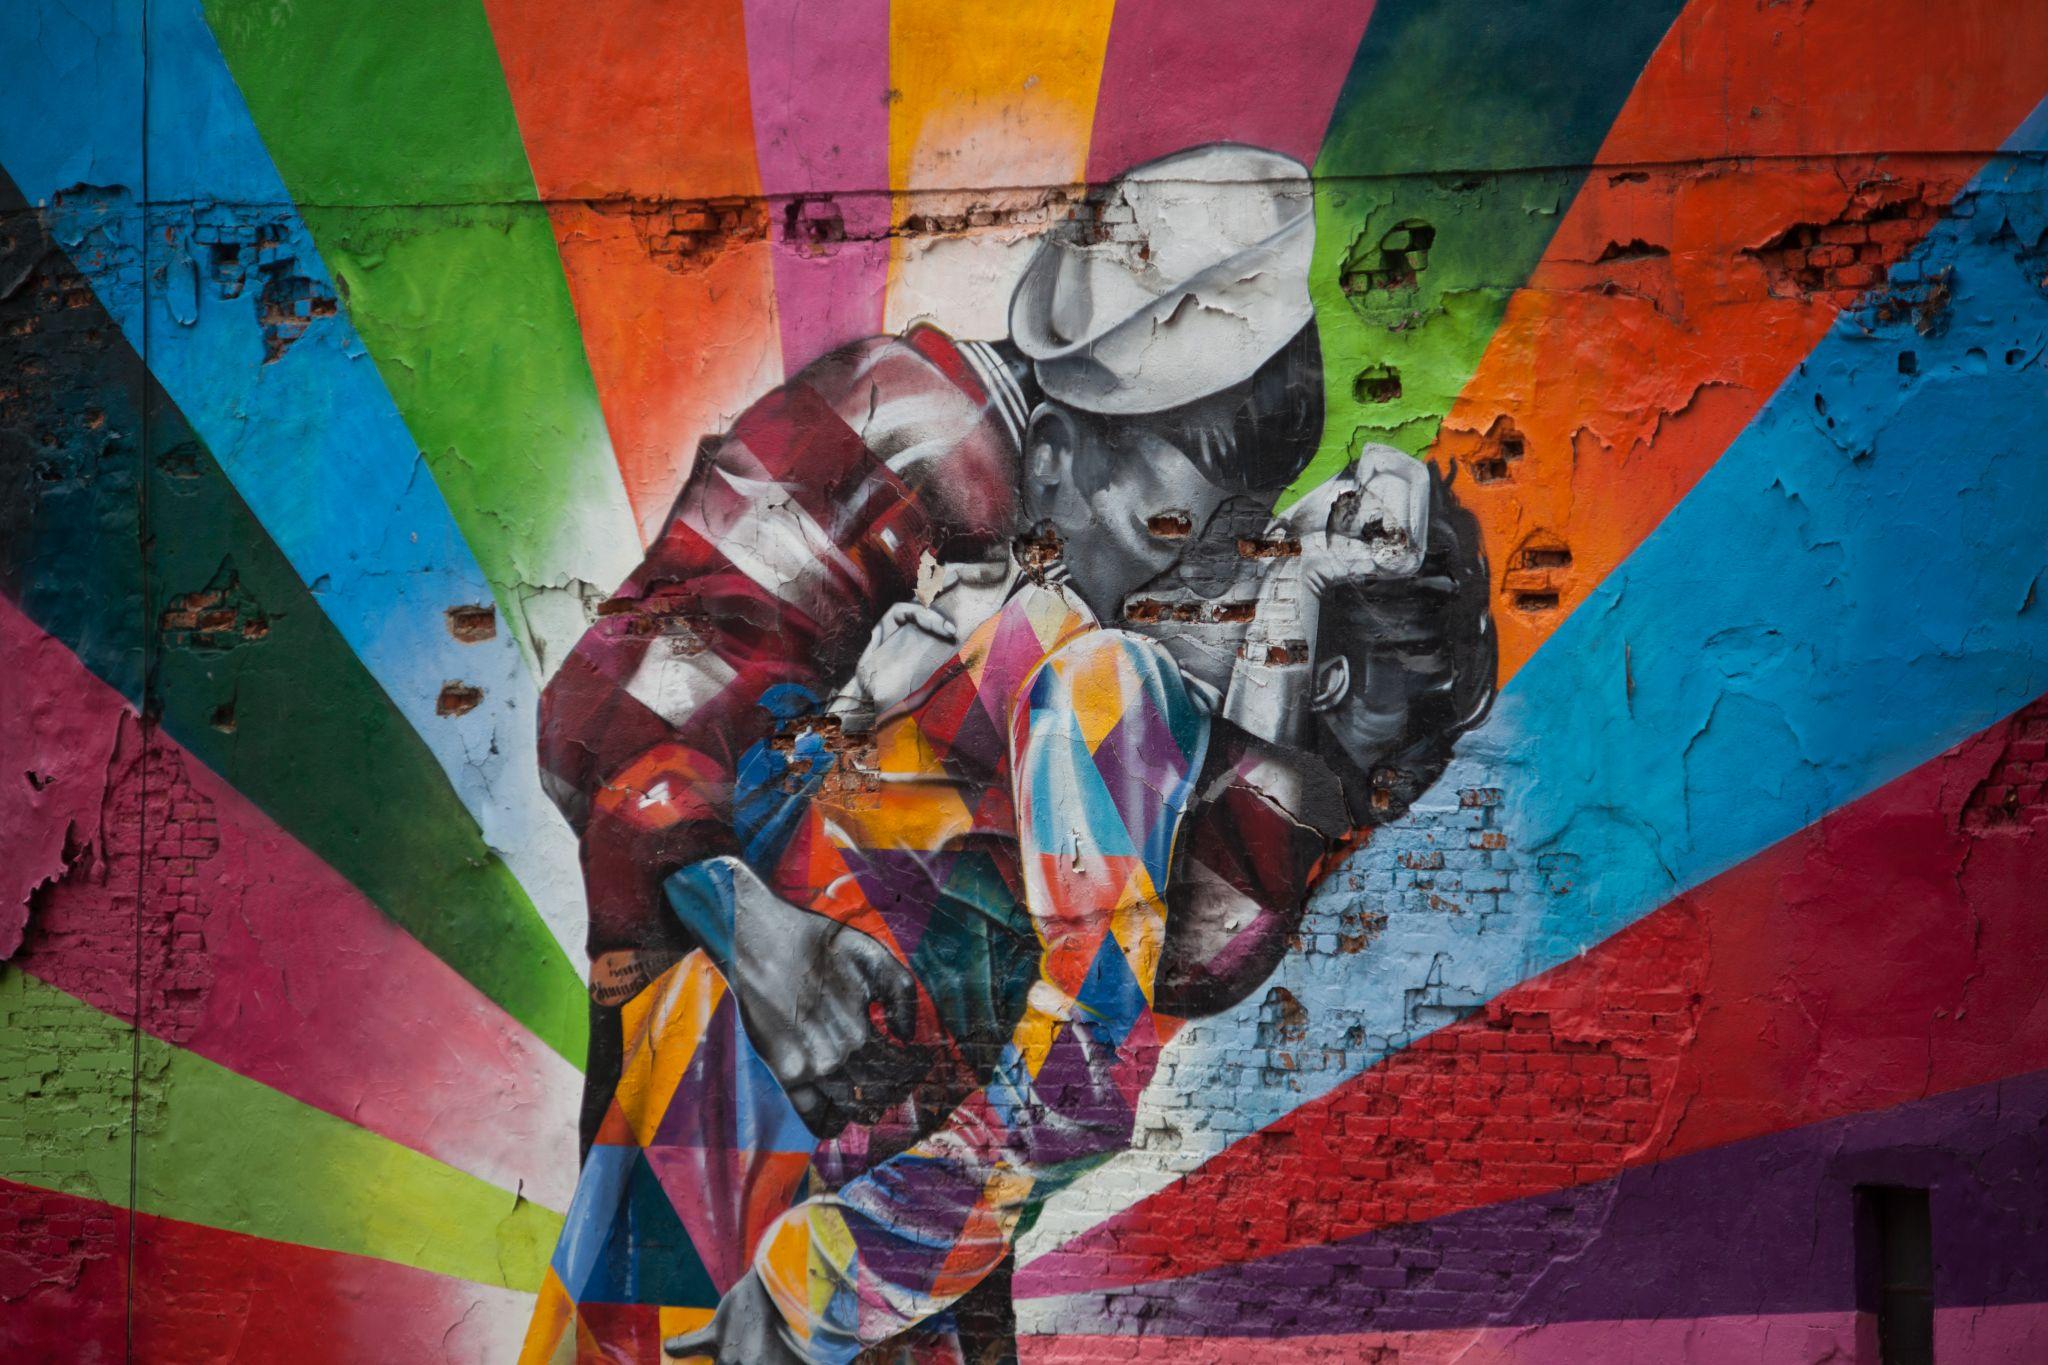 Wall painting, USA